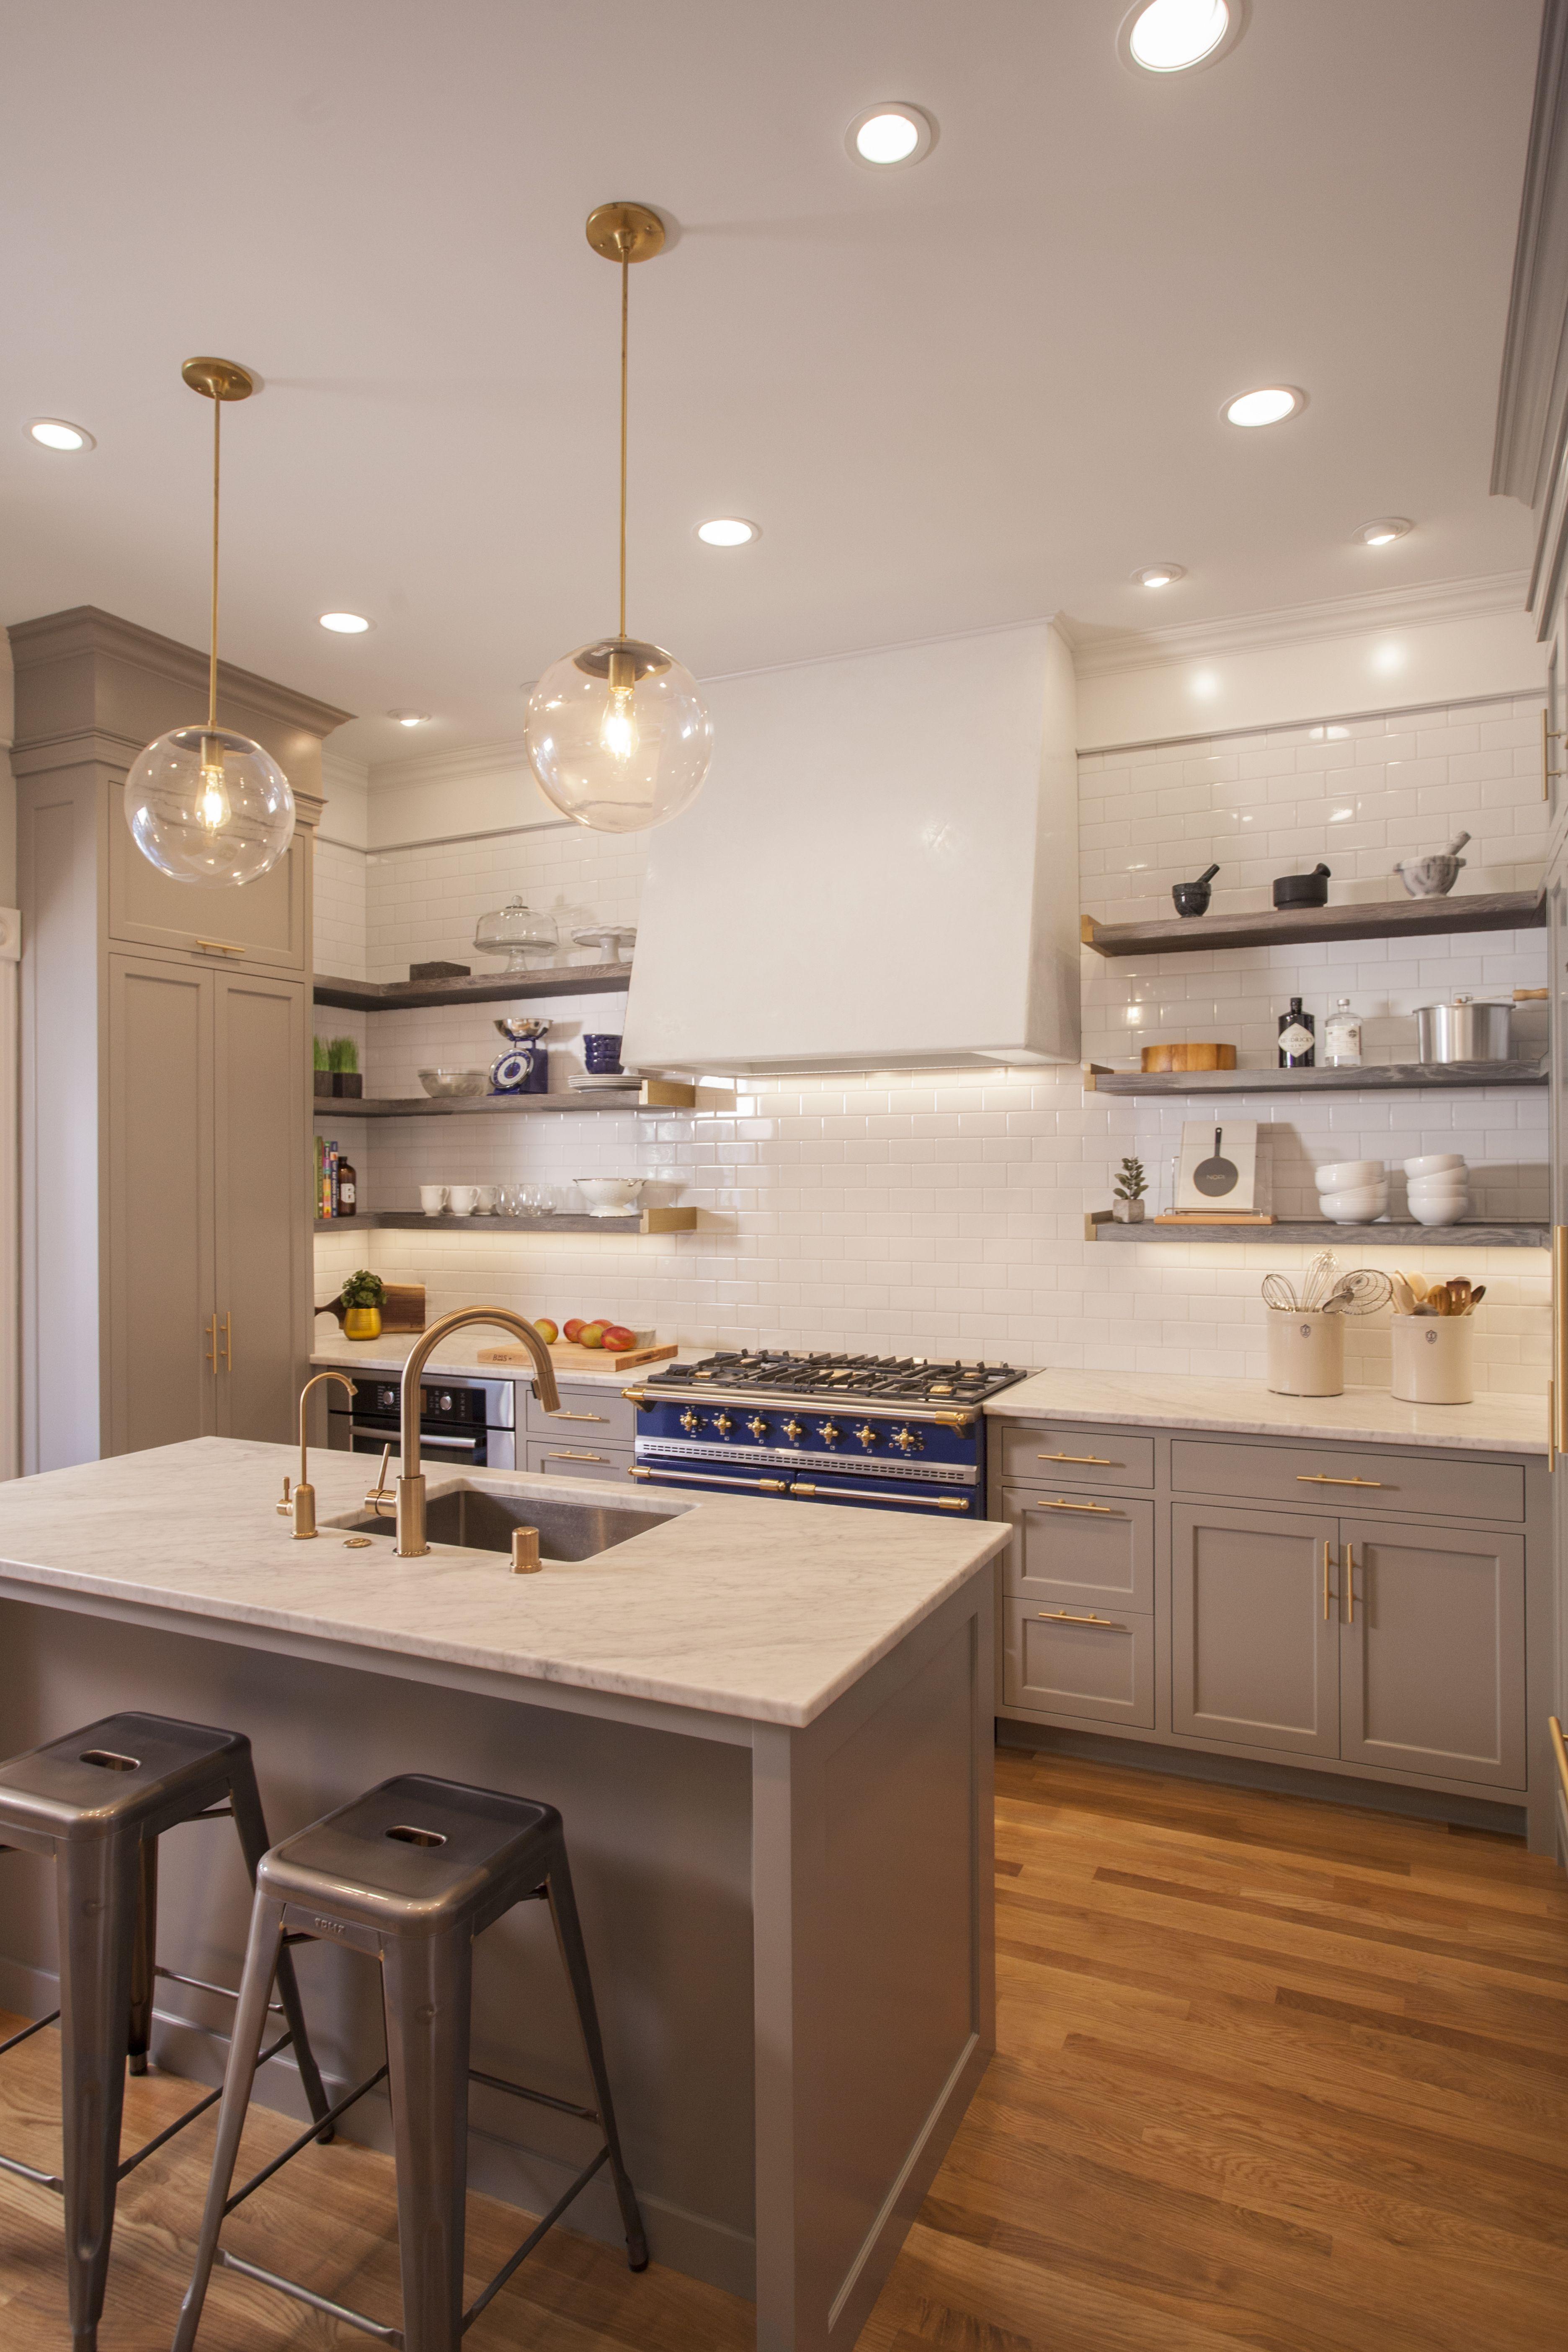 Modern Style Open Shelves Kitchen Ideas #Kitchenstorage #Modernkitchen #Shelvingideas